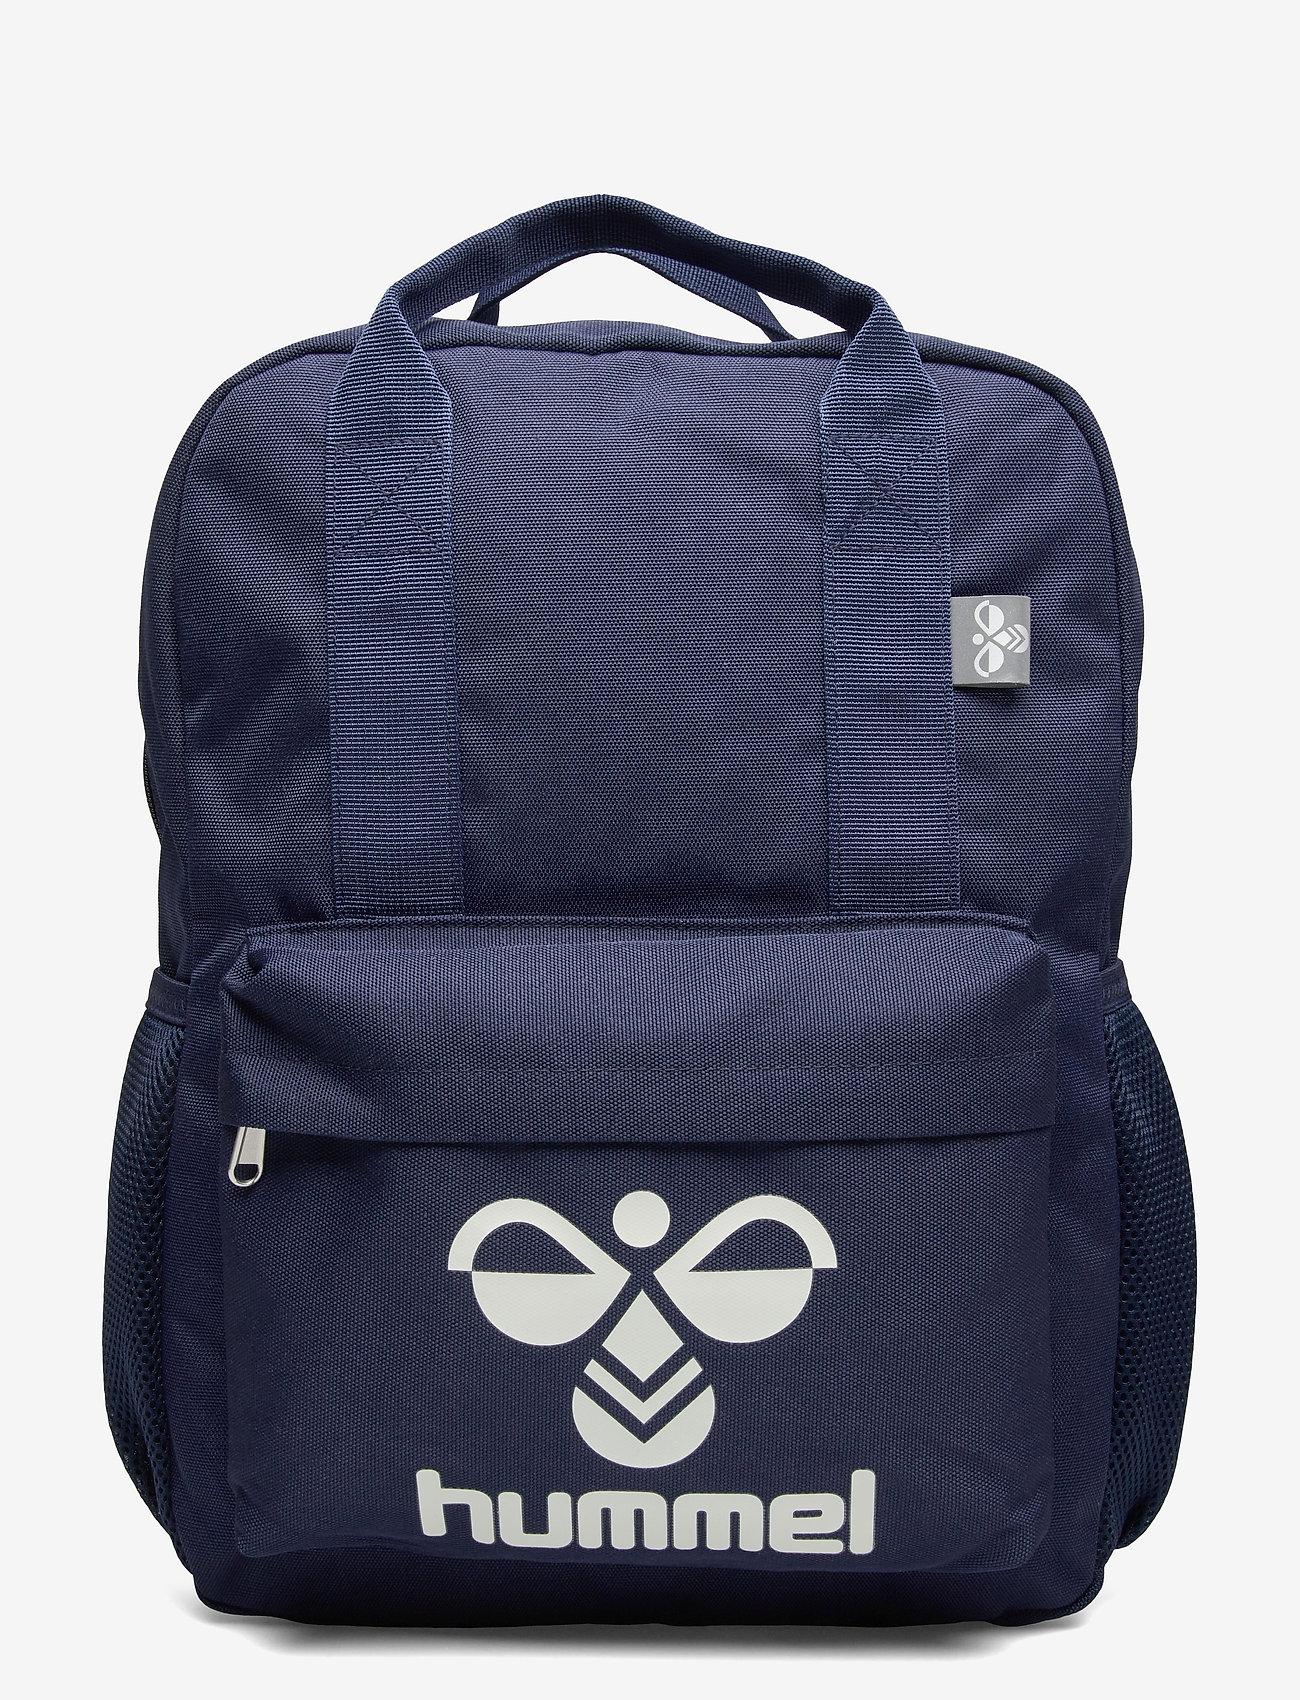 Hummel - hmlJAZZ BACK PACK - plecaki - black iris - 1